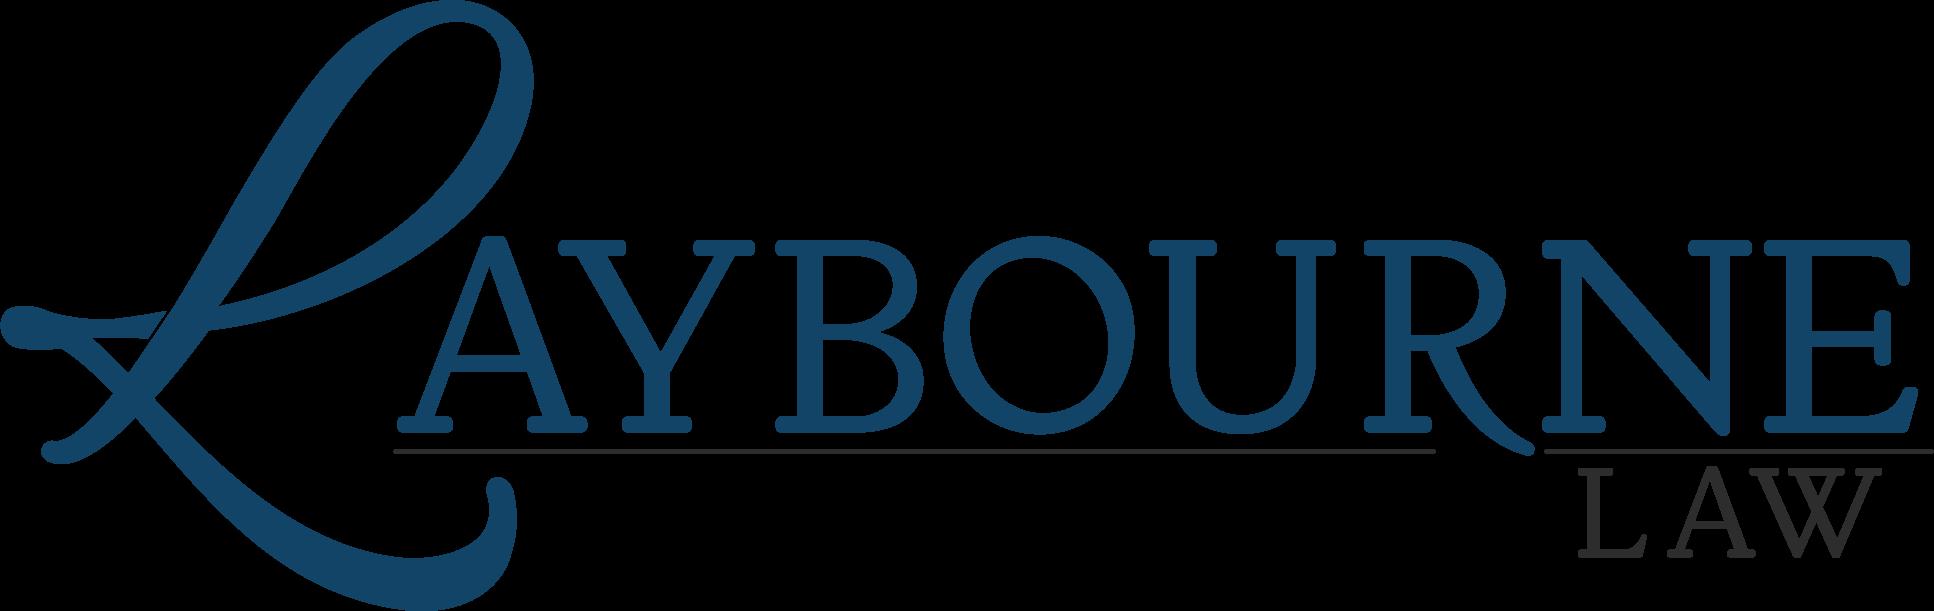 Laybourne Law - Attorneys at Law  |  Robert Laybourne & Jeff Laybourne  |  Akron - Summit County - Northeast Ohio Logo